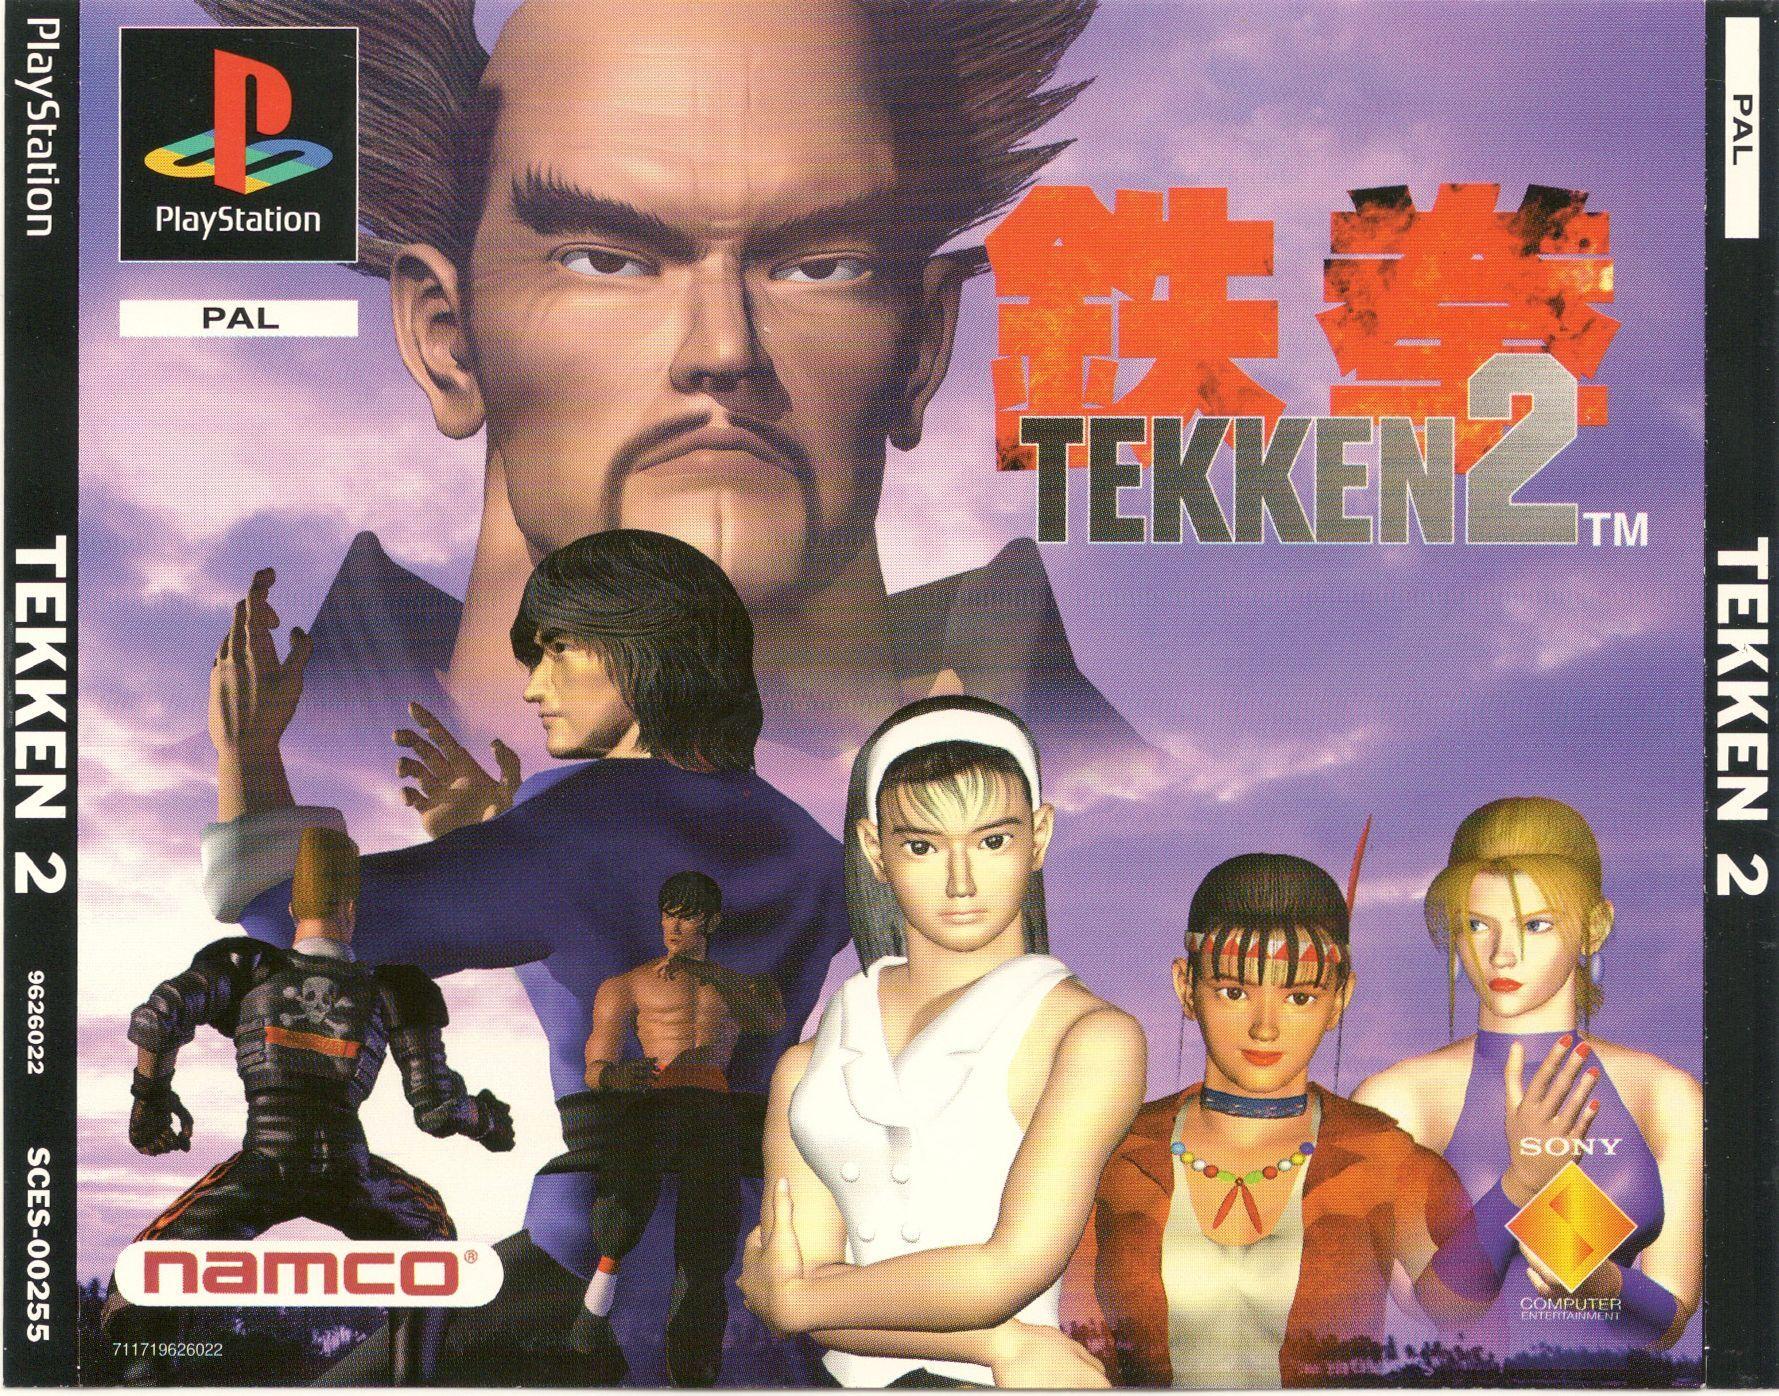 Tekken 2 PSX cover | Tekken 2, Classic video games, Playstation games